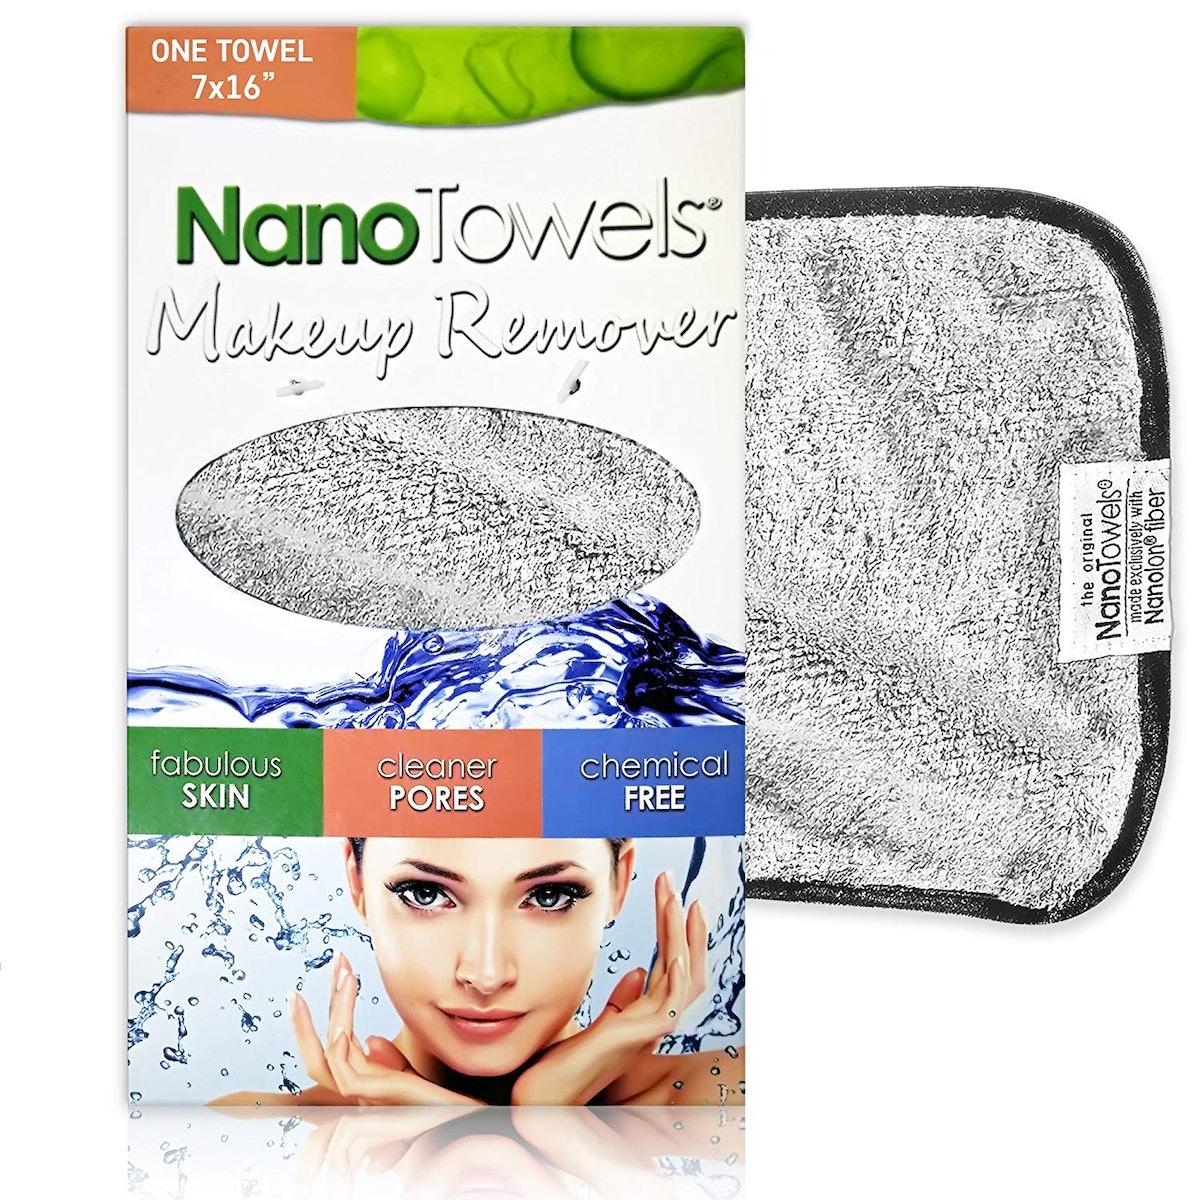 Nano Towels Makeup Remover Wipes